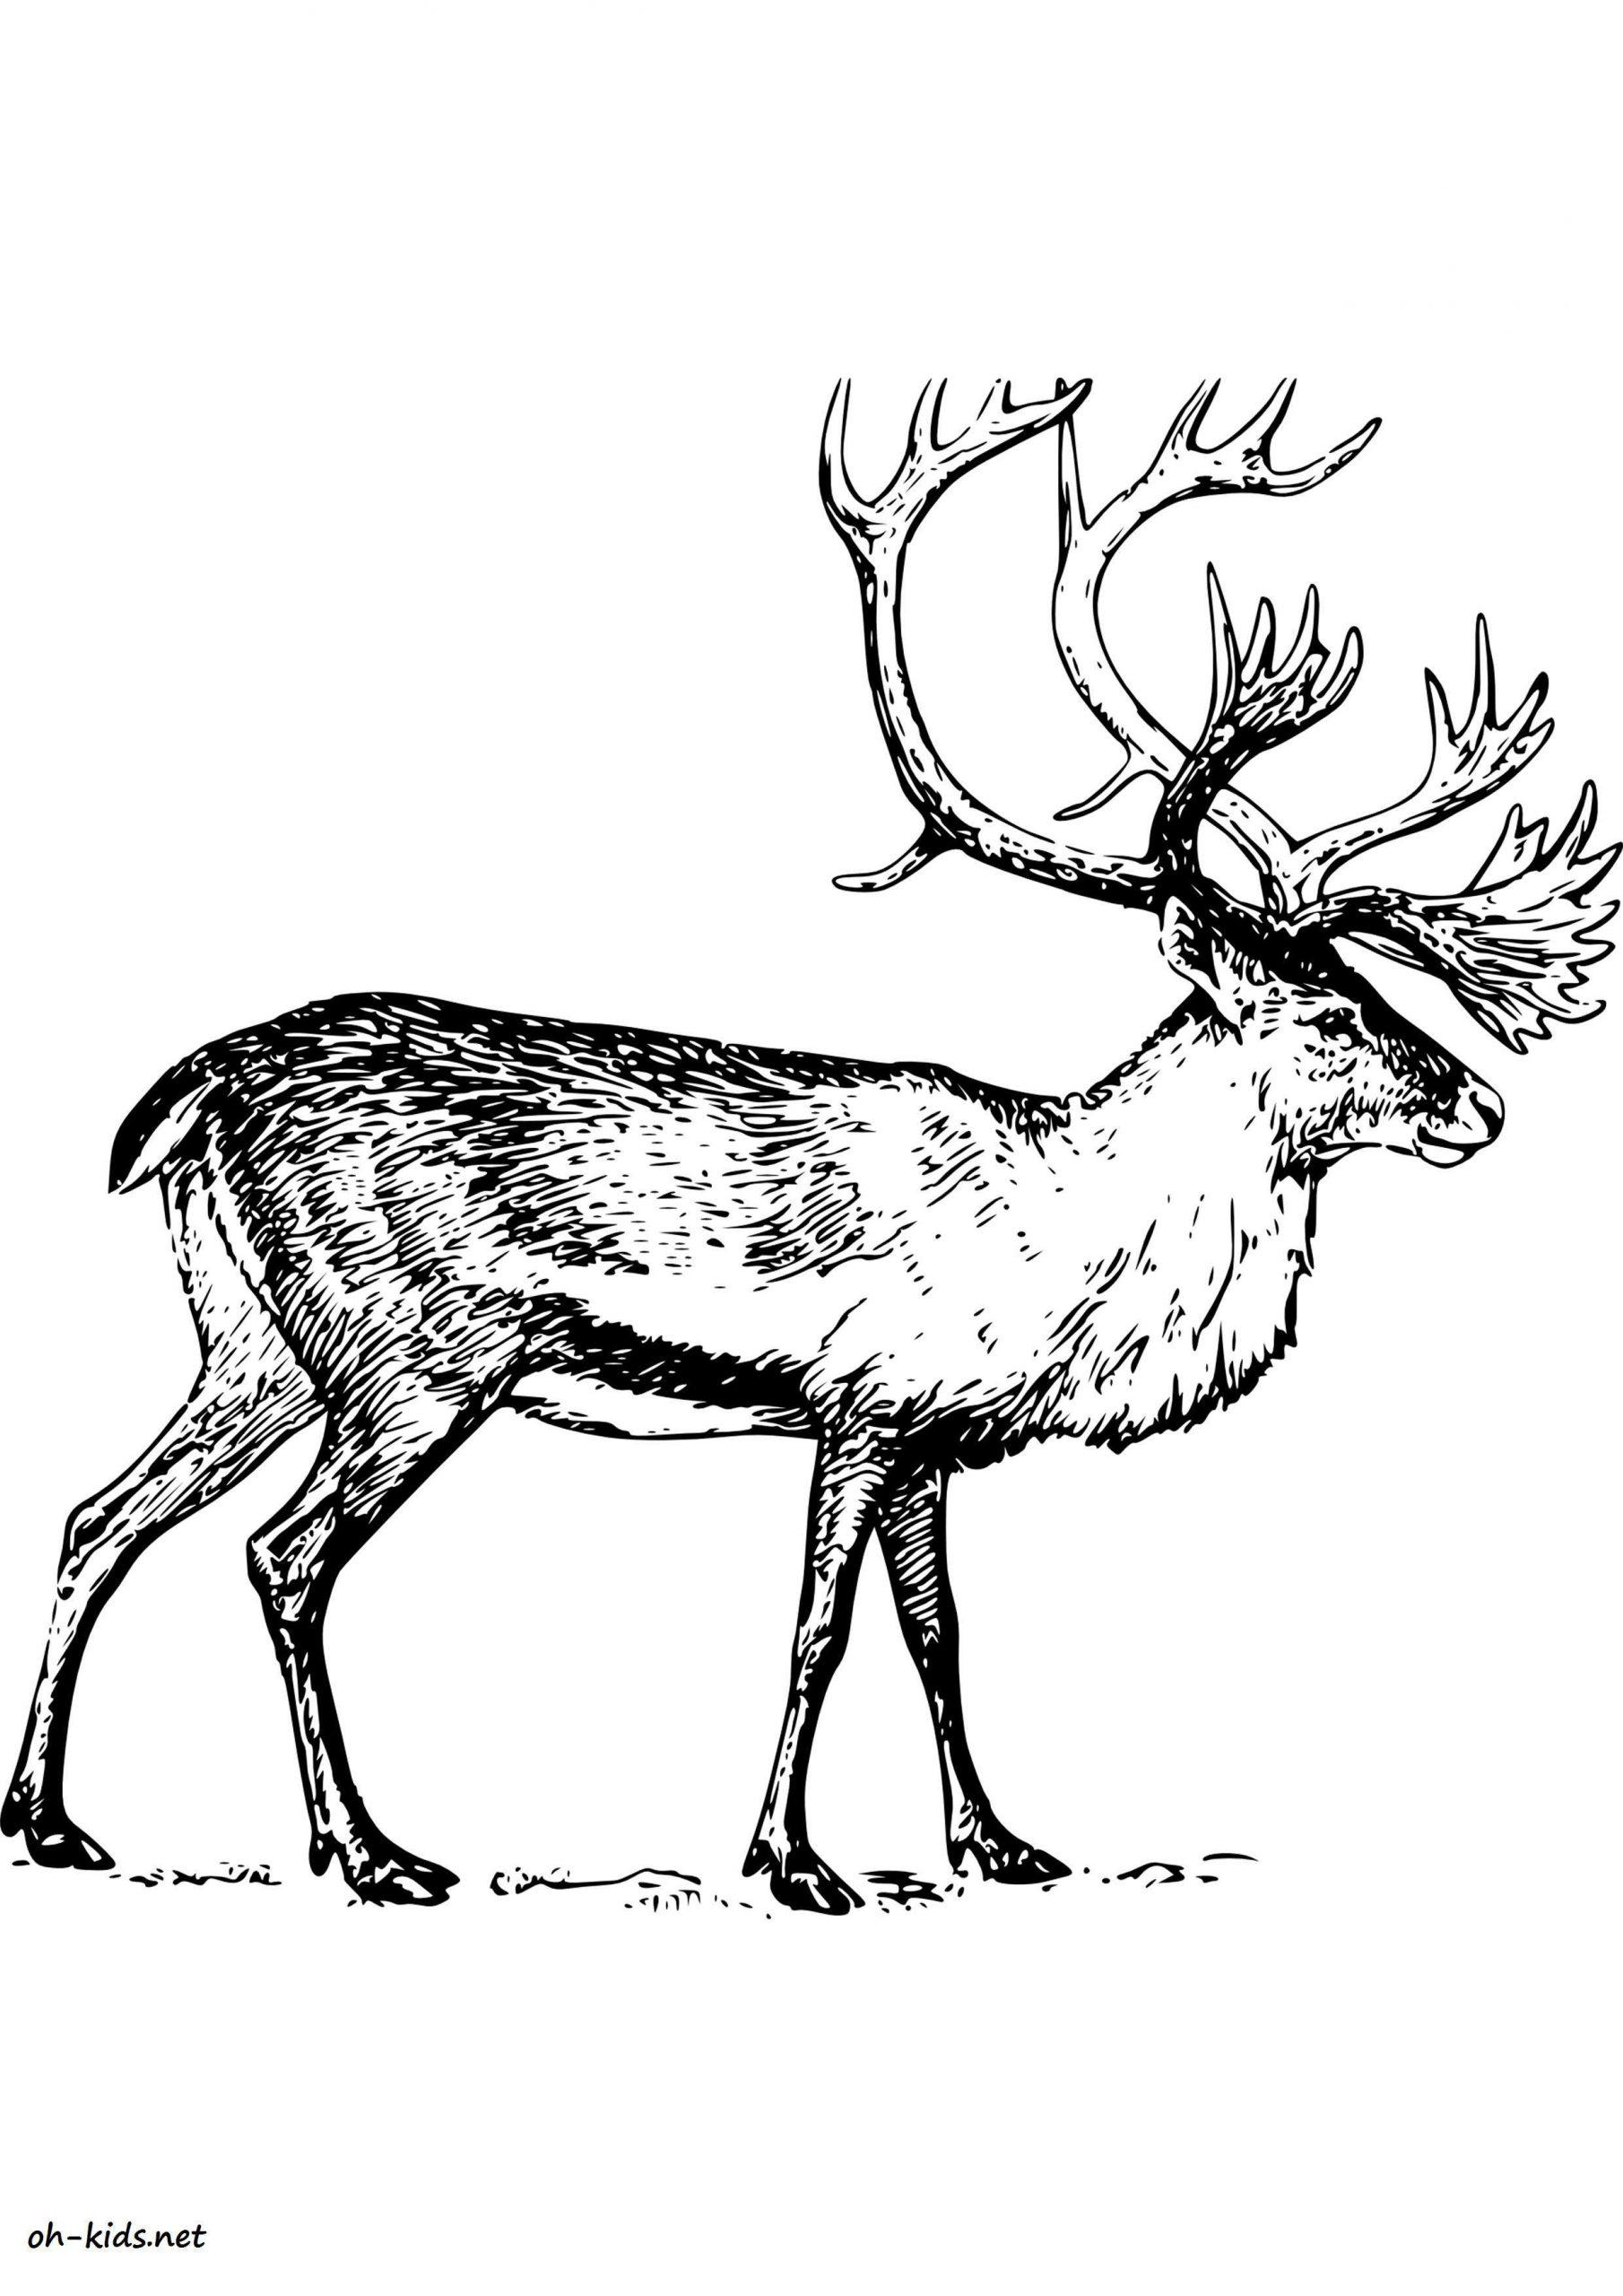 Dessin #1295 - Coloriage Caribou À Imprimer - Oh-Kids à Caribou Dessin